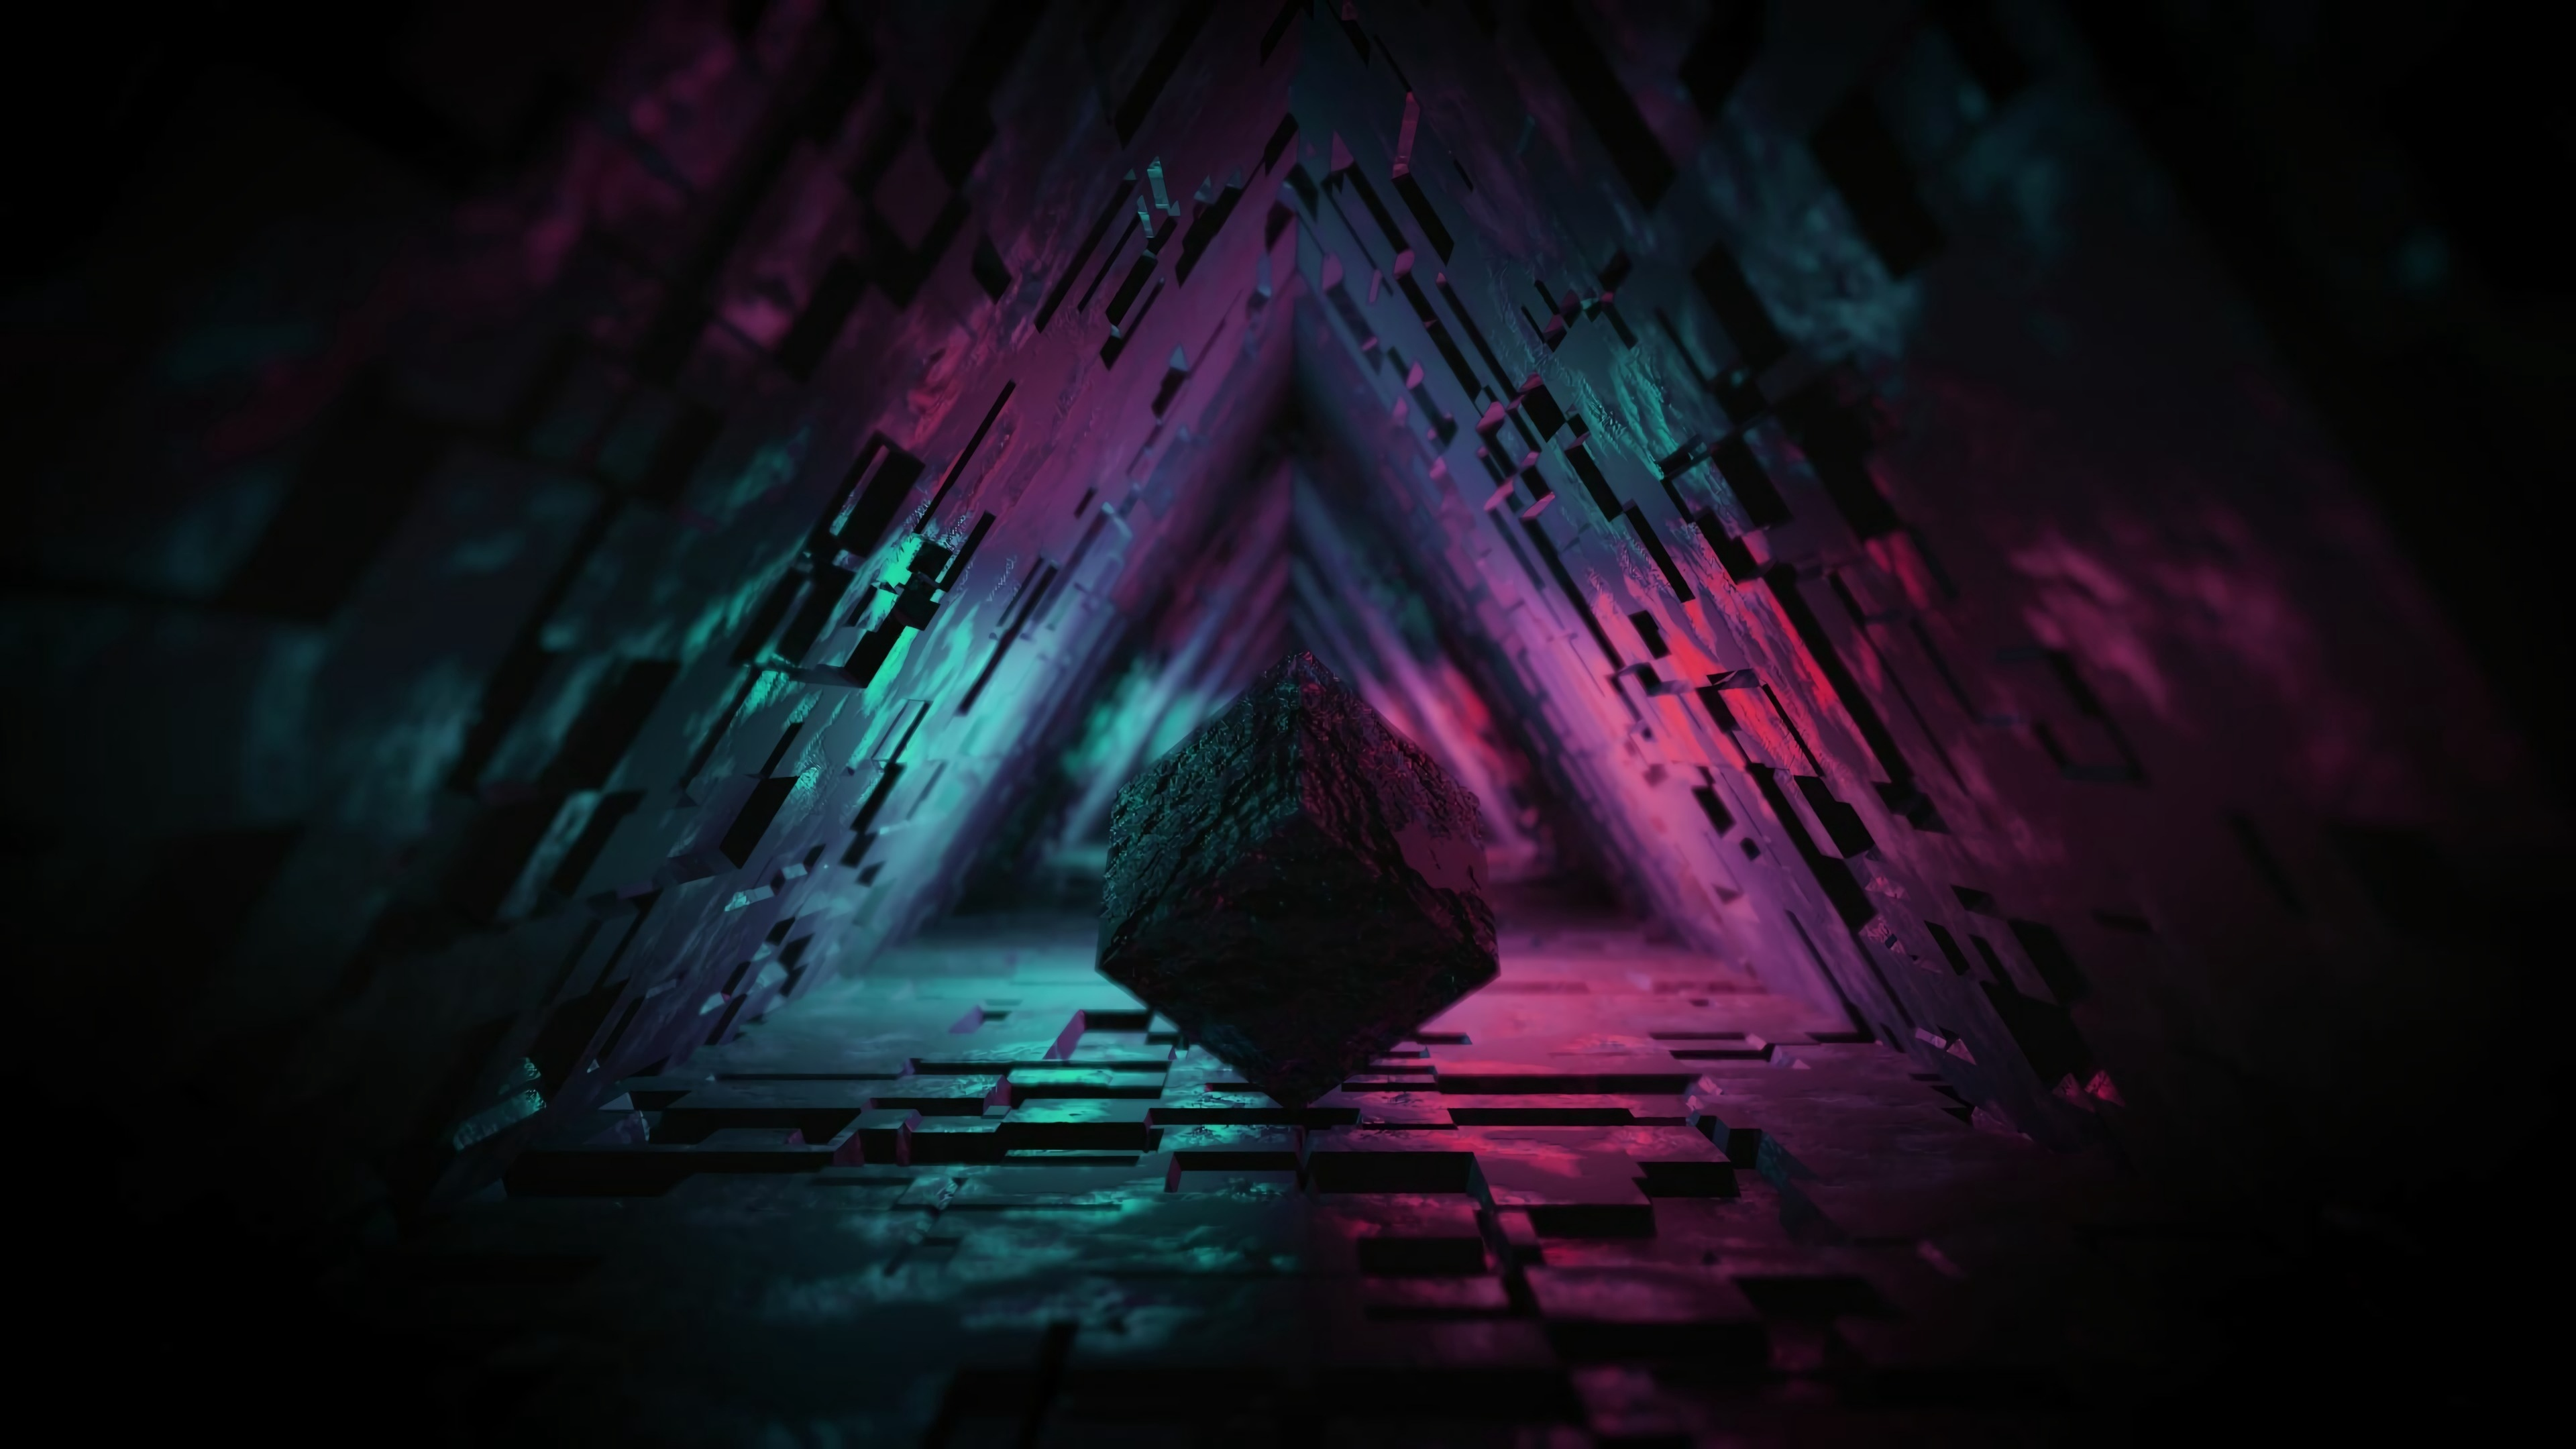 digital-cave-3d-triangle-4k-ub.jpg